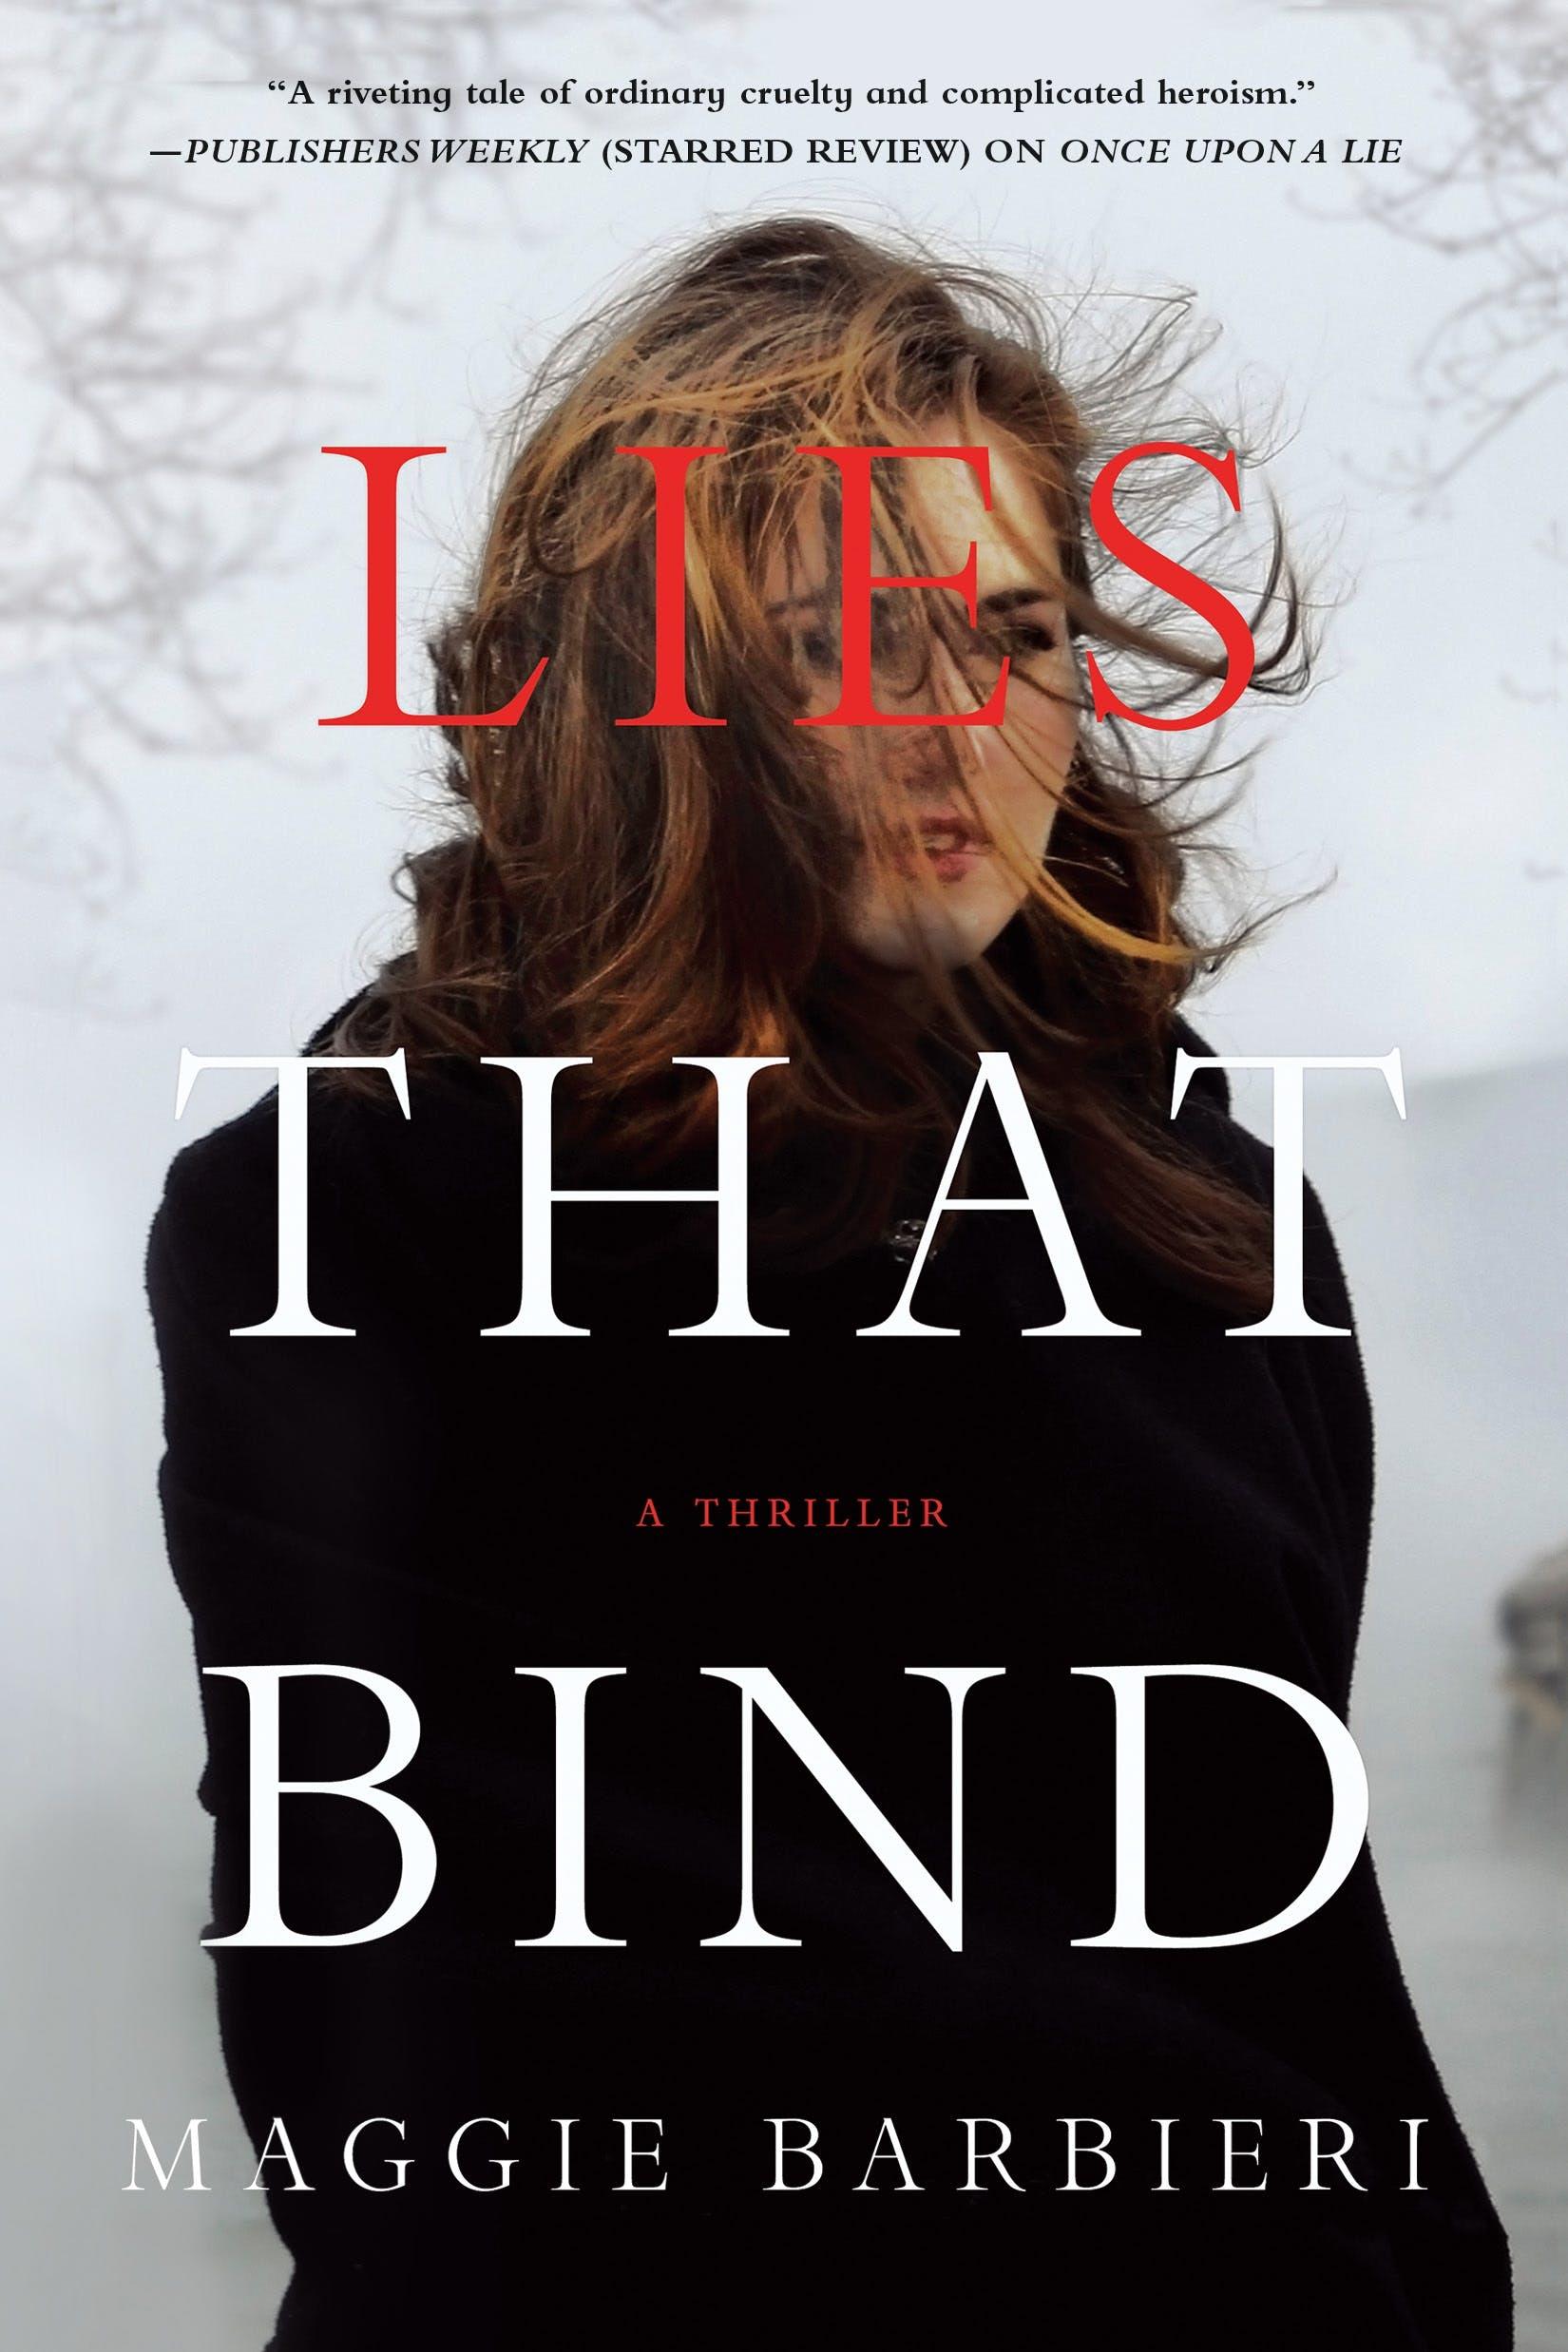 Image of Lies That Bind